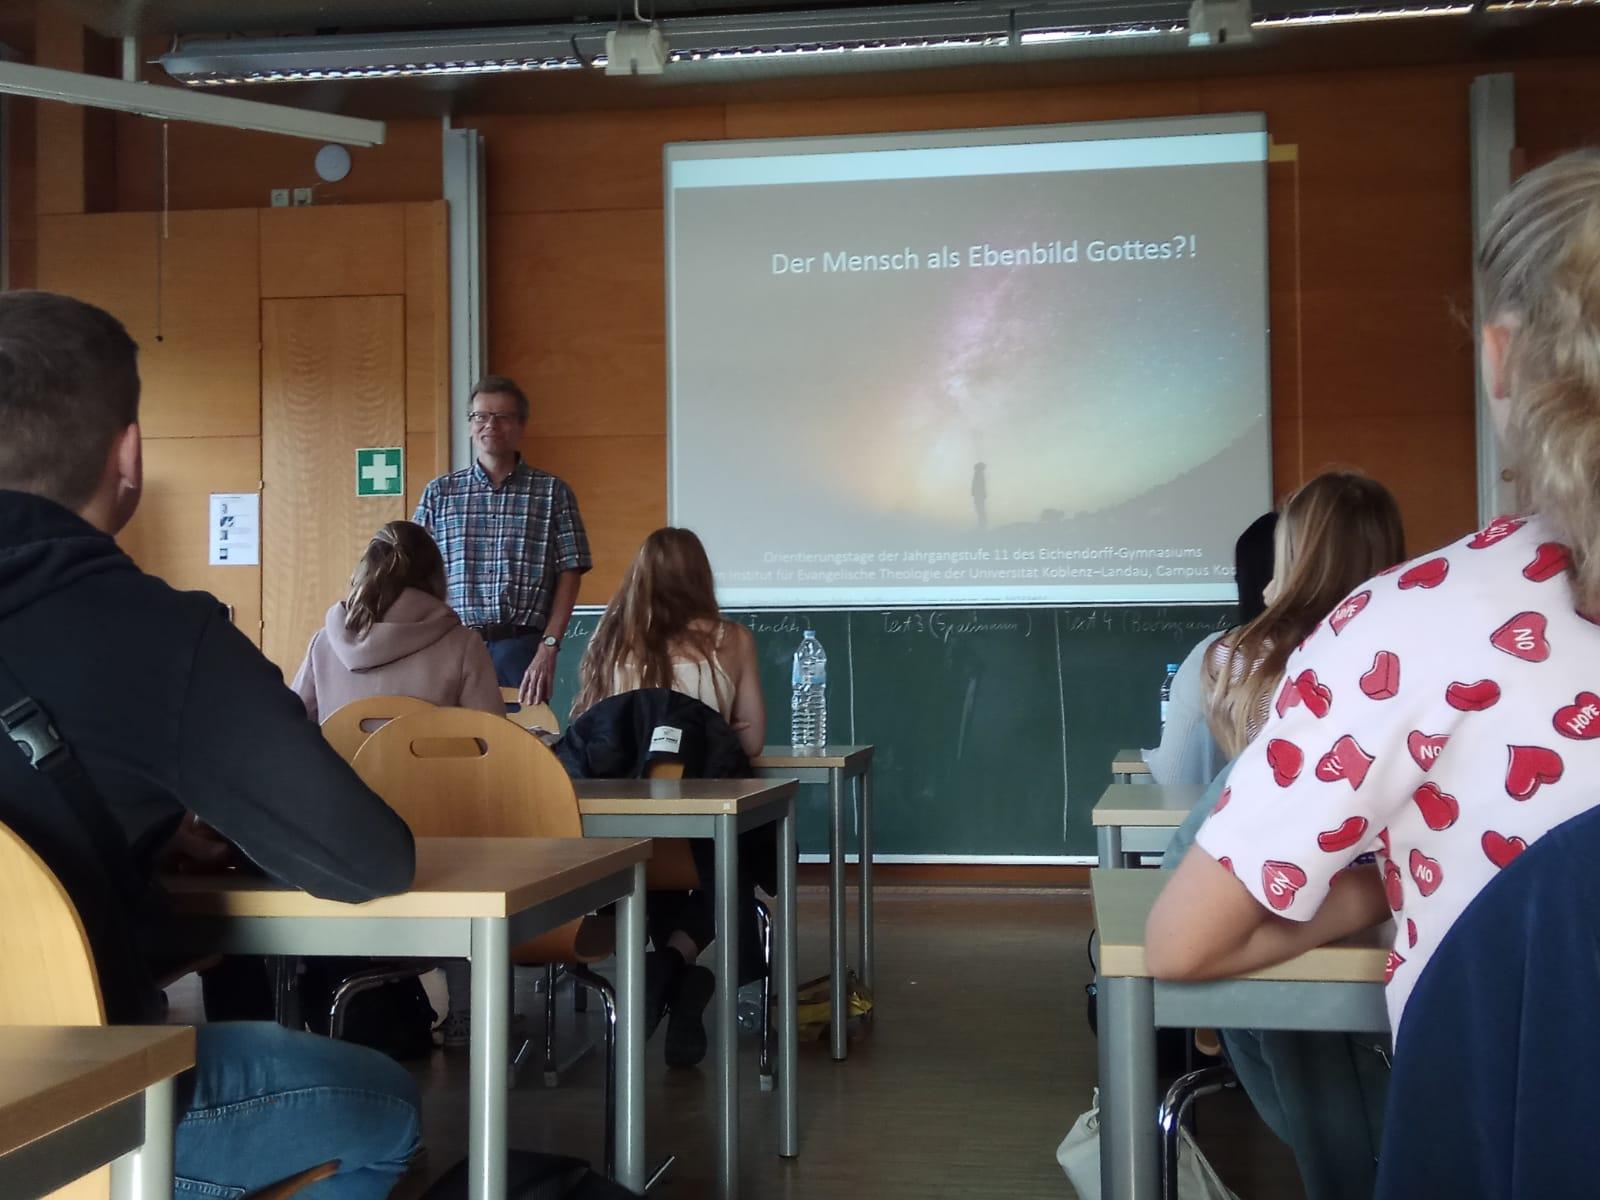 Der Mensch als Gottes Ebenbild? - Schüler zu Gast an der Universität in Koblenz